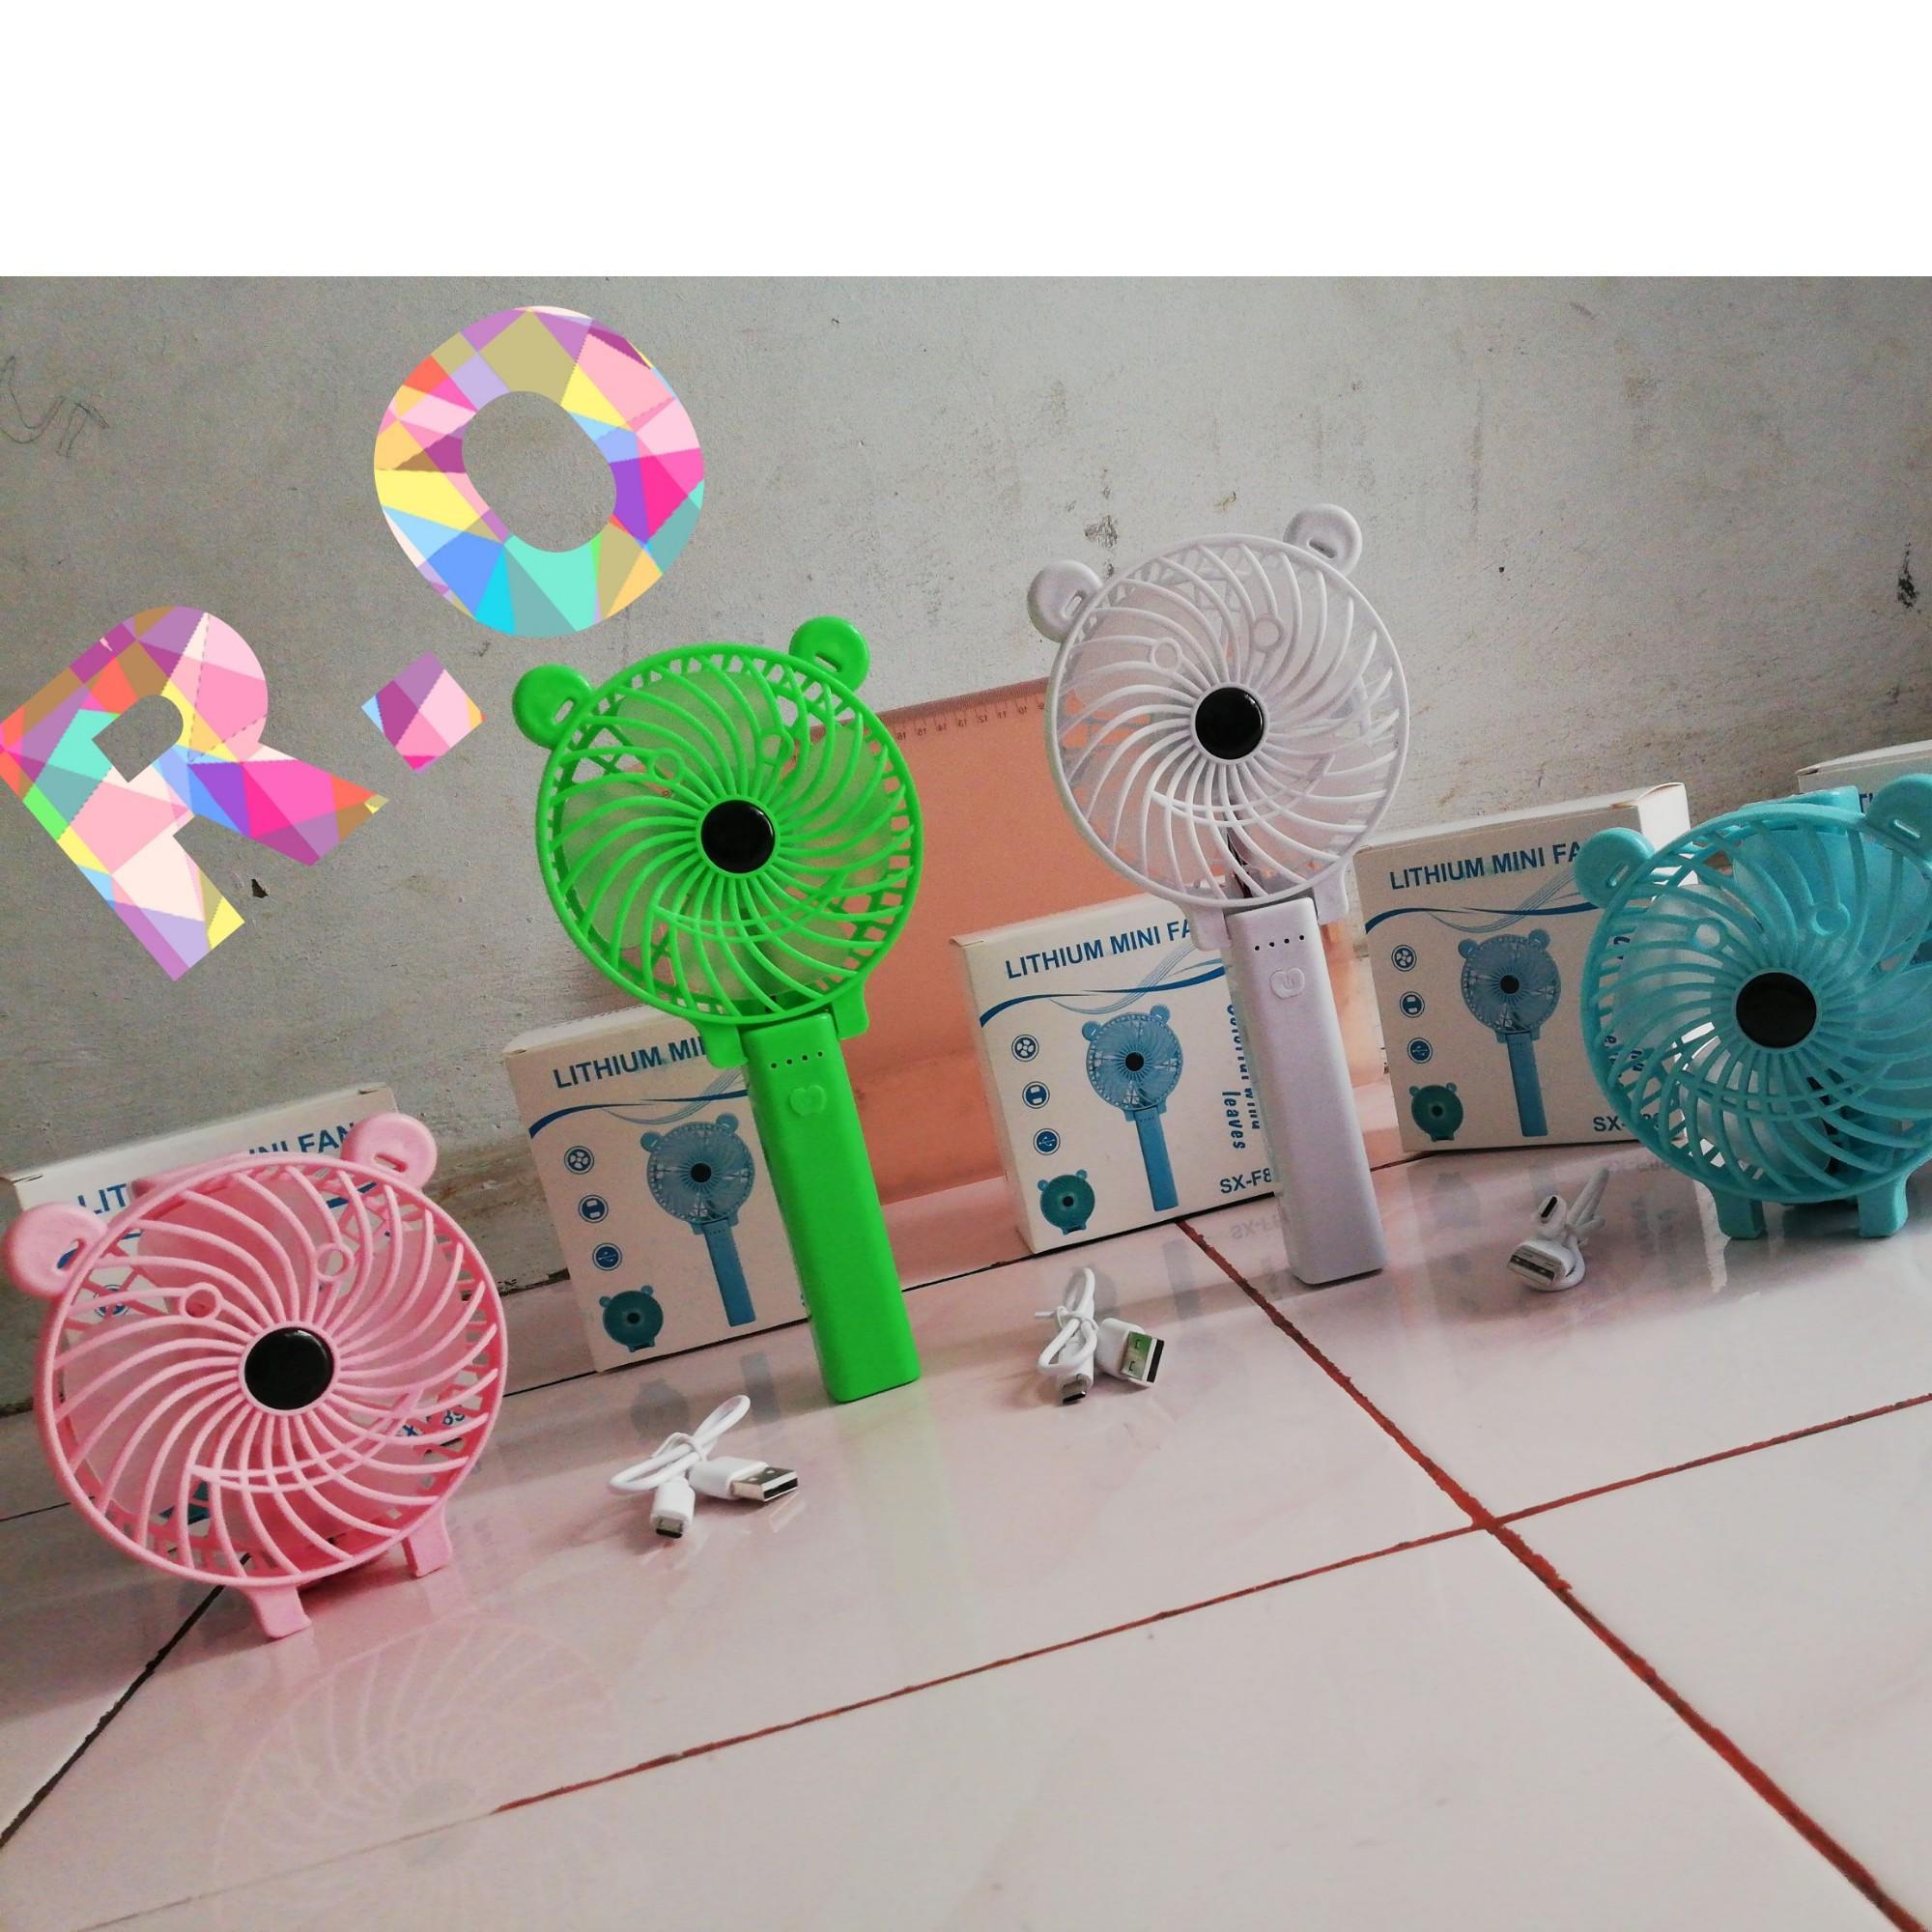 Paling Unik Kipas Angin Tangan Portable -- Mini Hand Fan (colorful wind leaves)